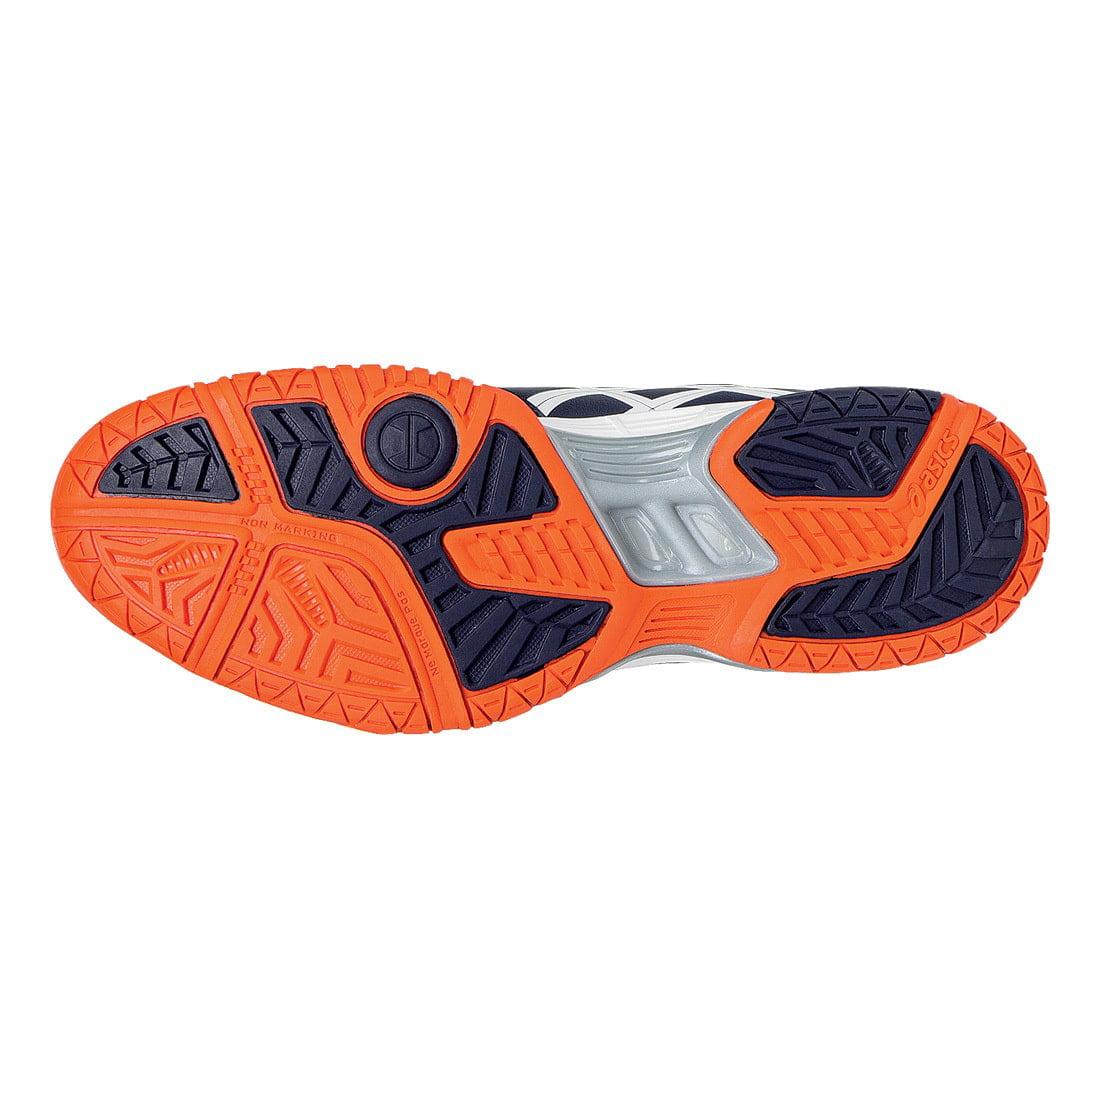 efc26f14c235 ASICS - Asics Gel Game 5 Mens Tennis Shoe Size  9.5 - Walmart.com